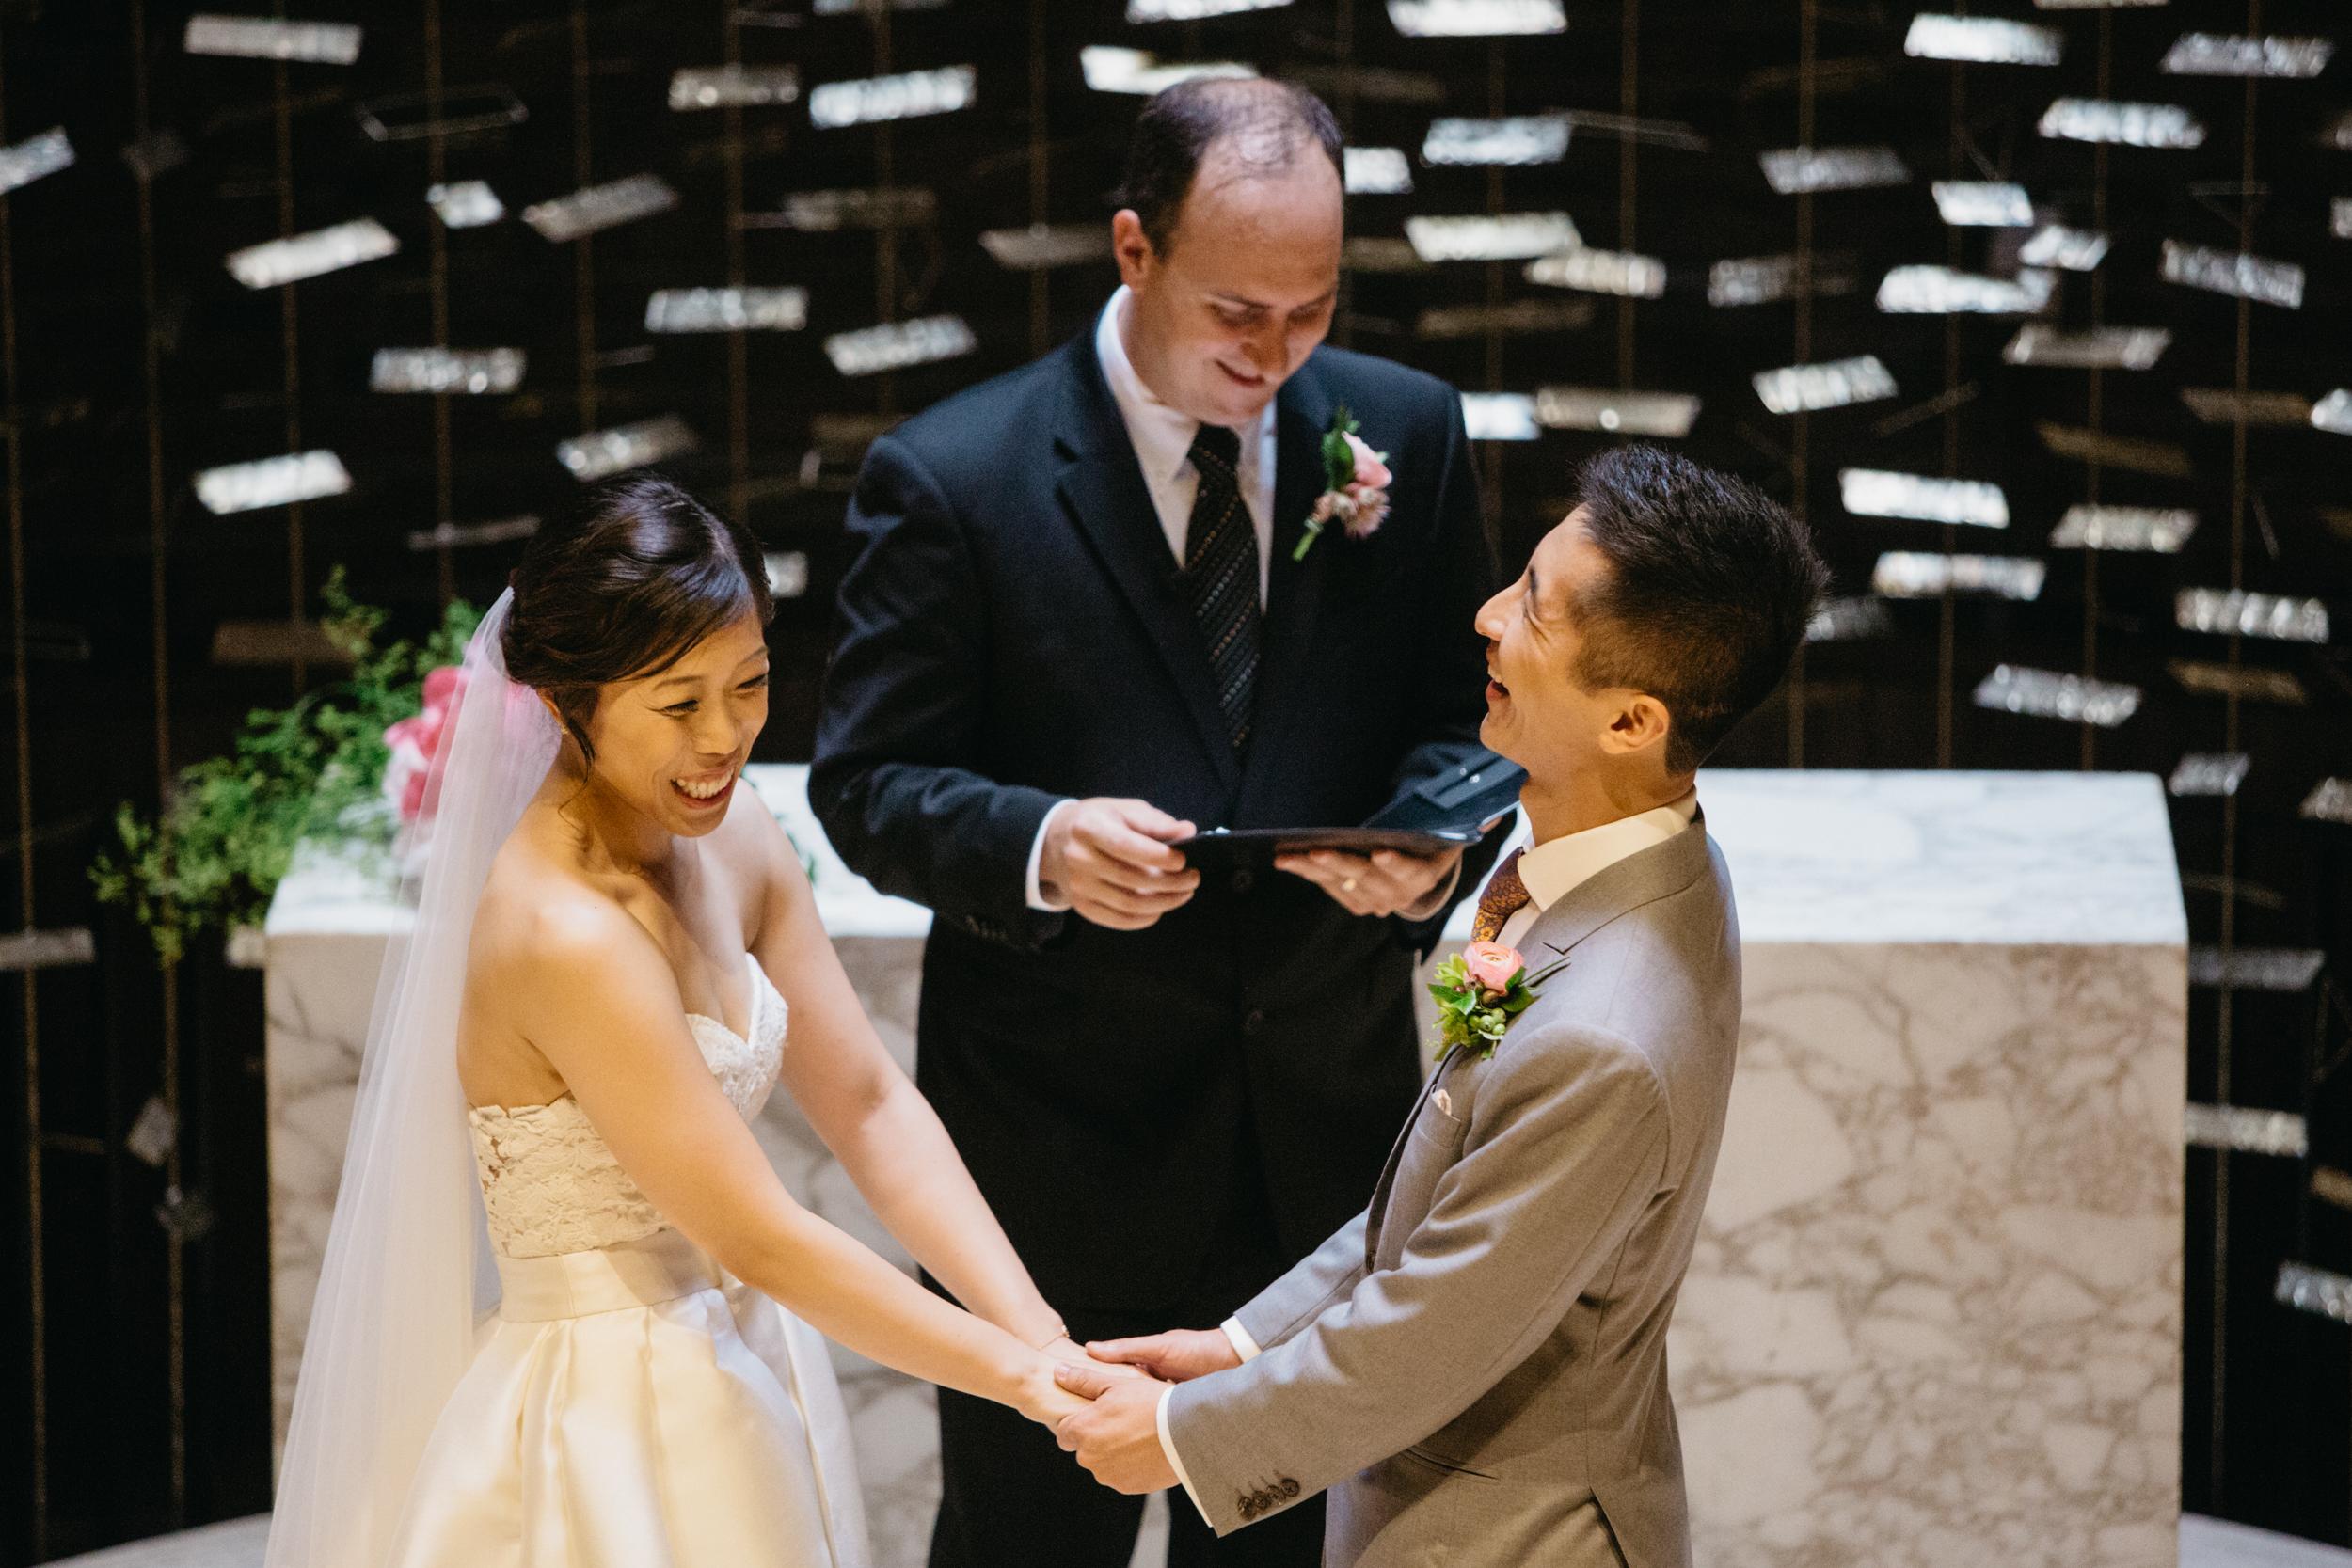 Mindy_Bo_Boston_Wedding_MIT_HotelCommonwealth_015.jpg